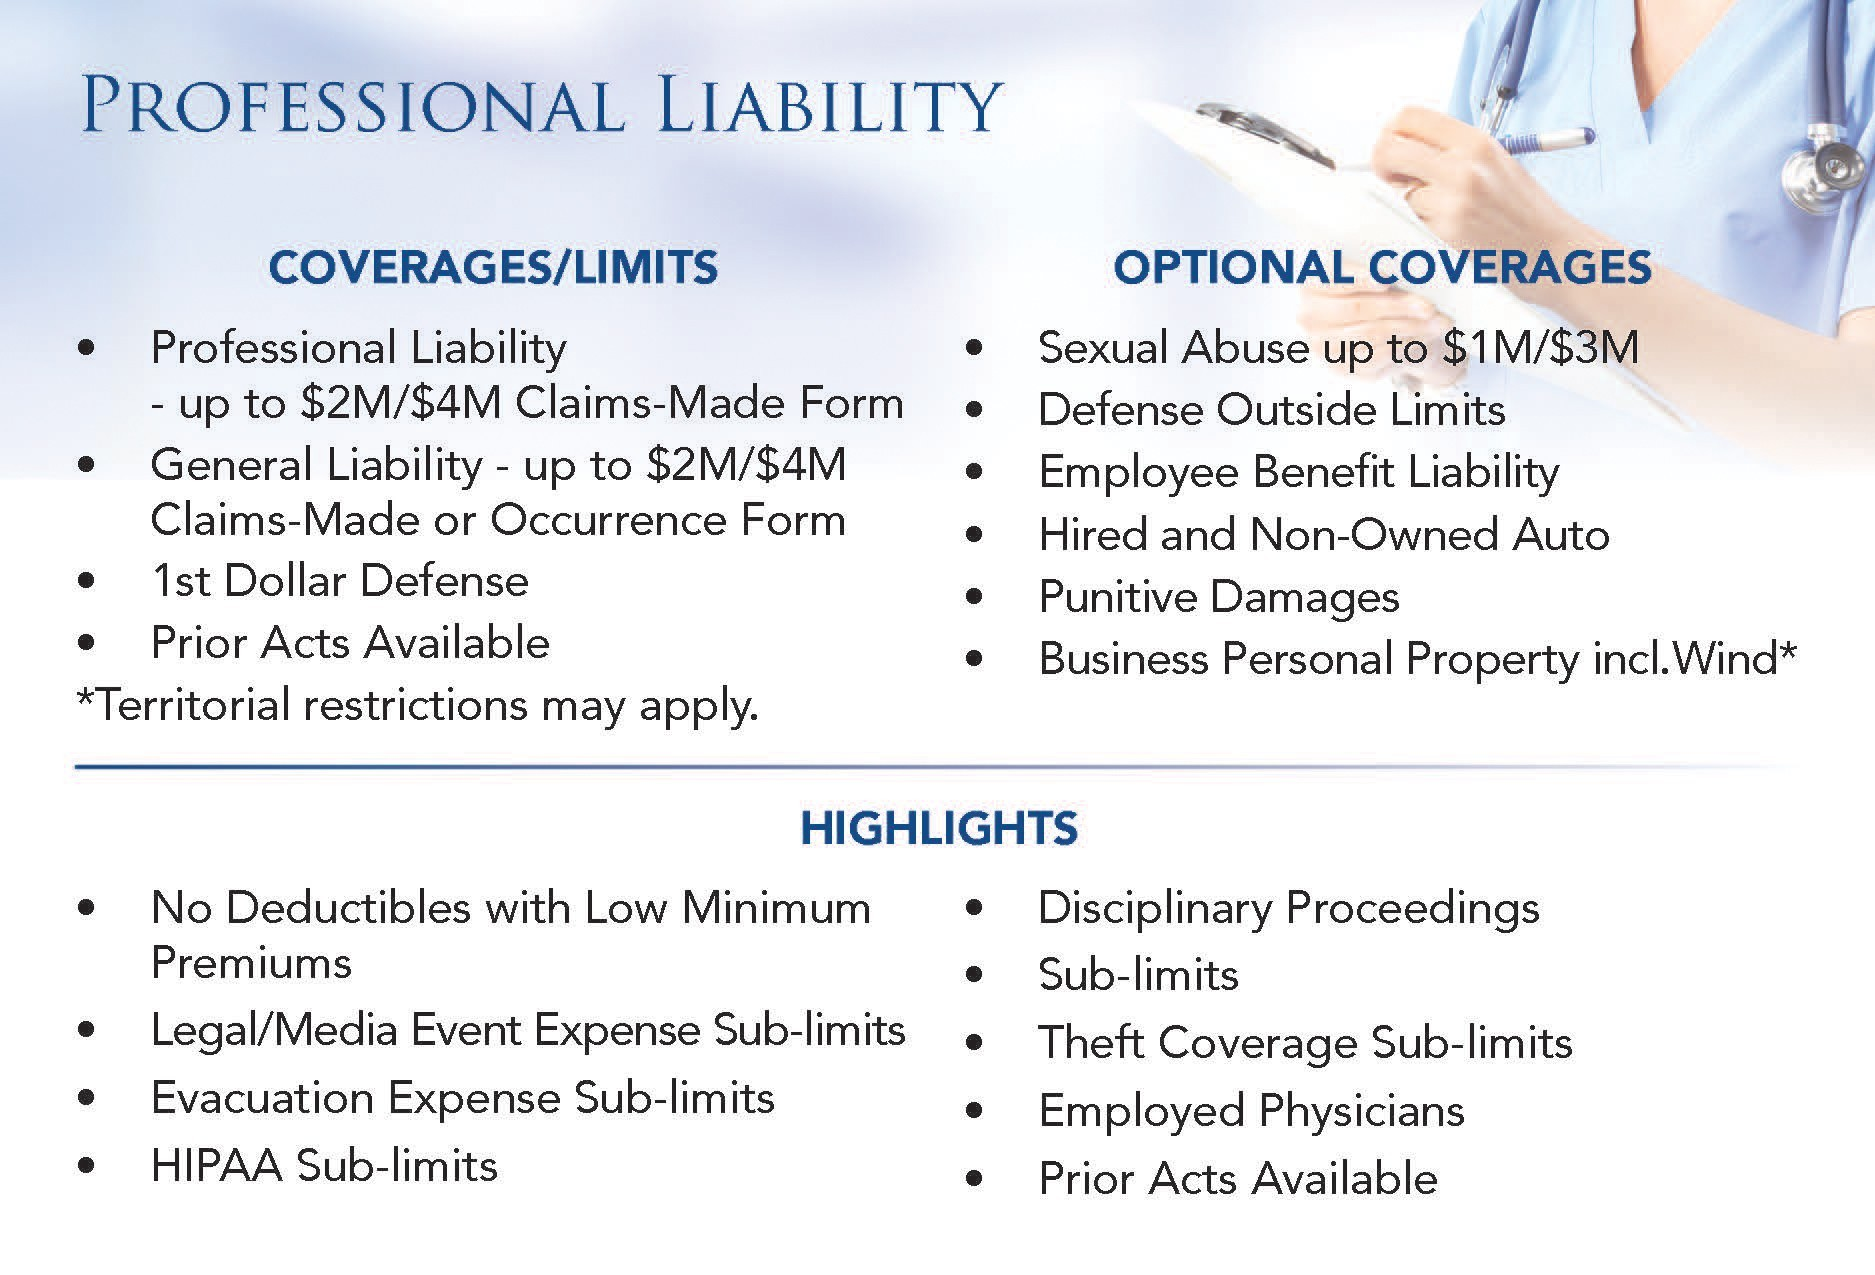 Ascendant Professional Liability